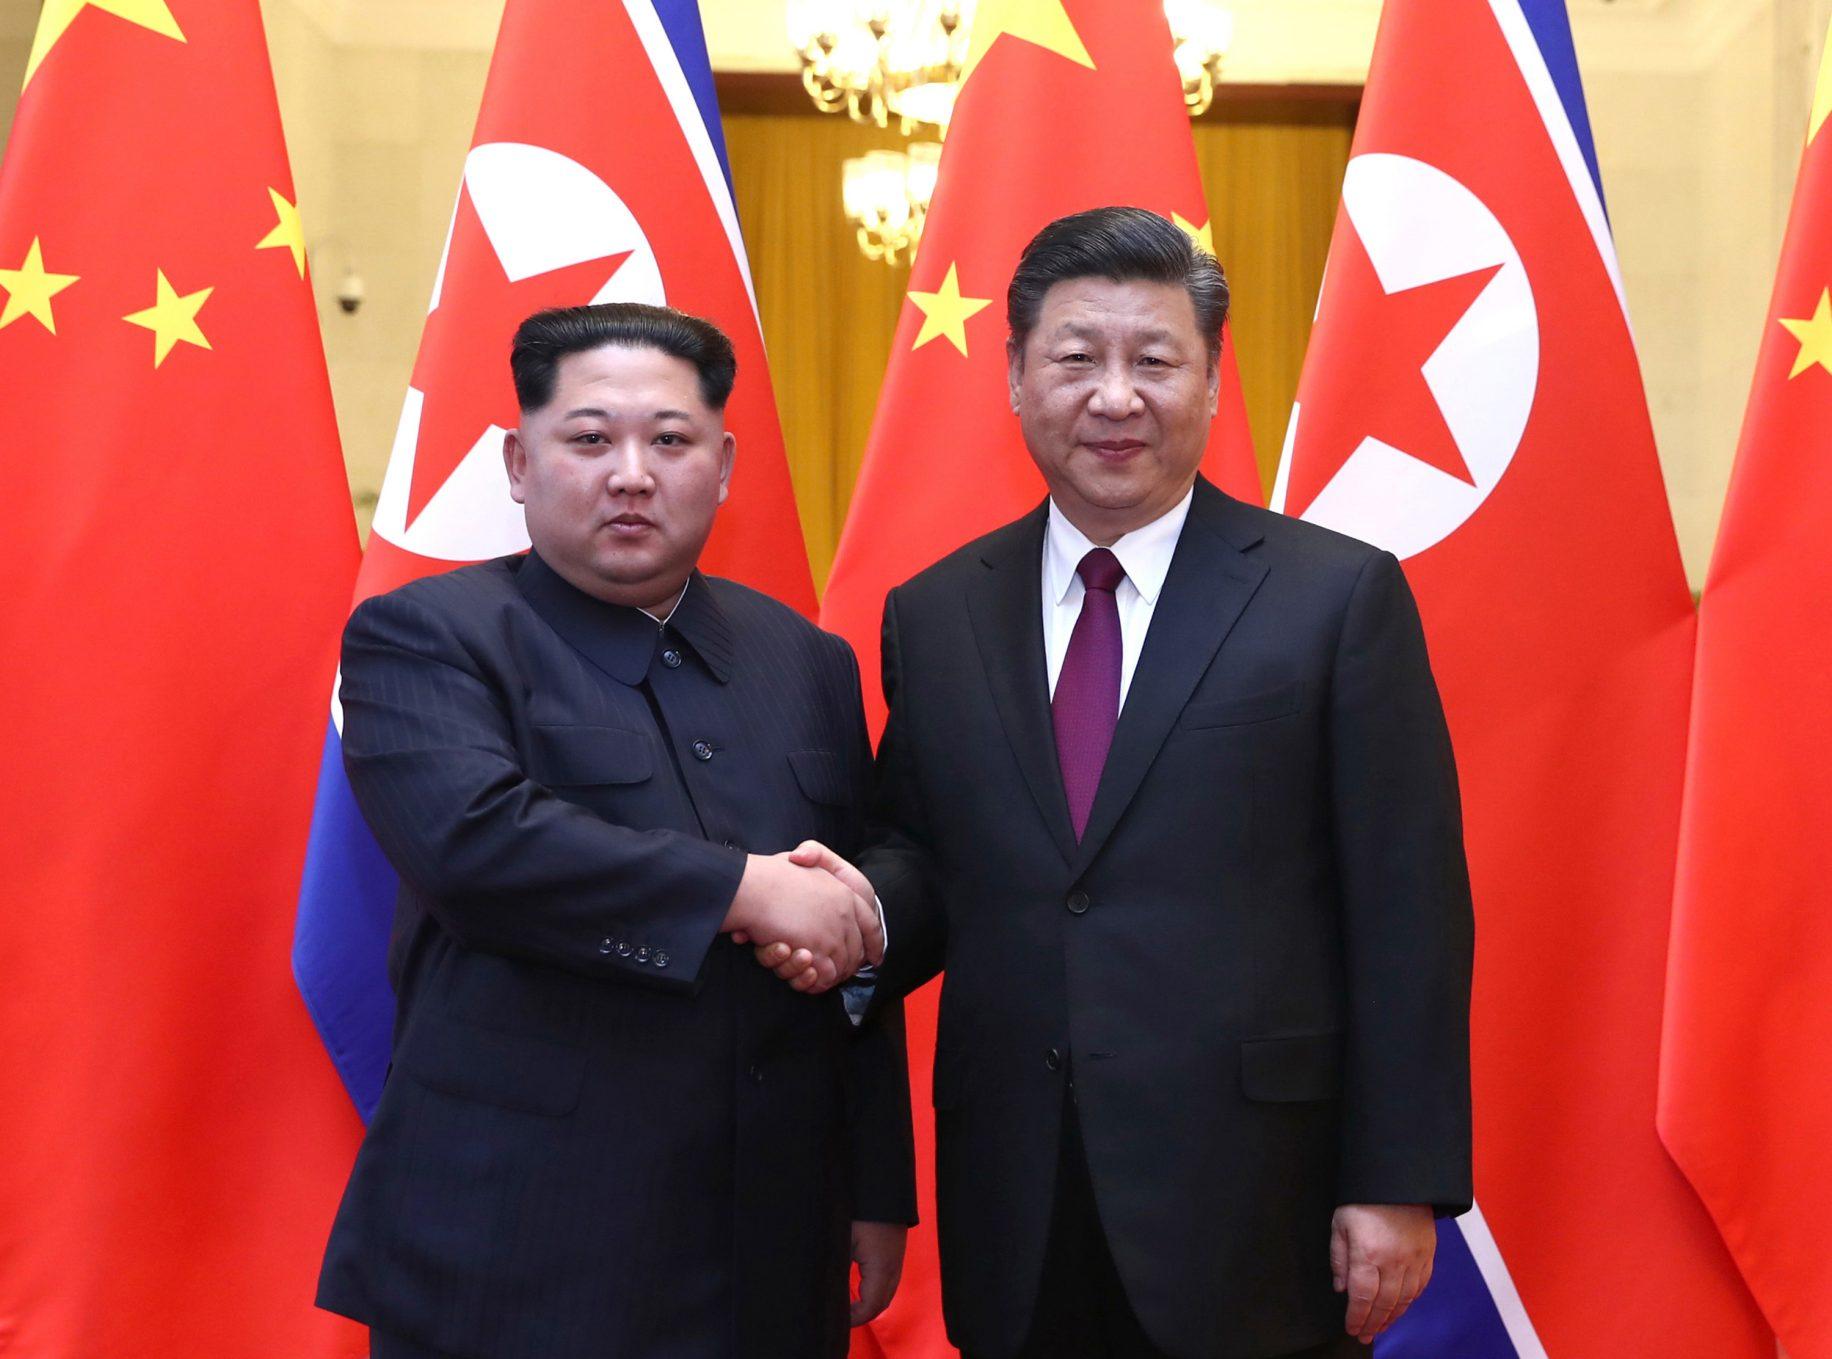 Kim Jong Un pledges stronger ties to China